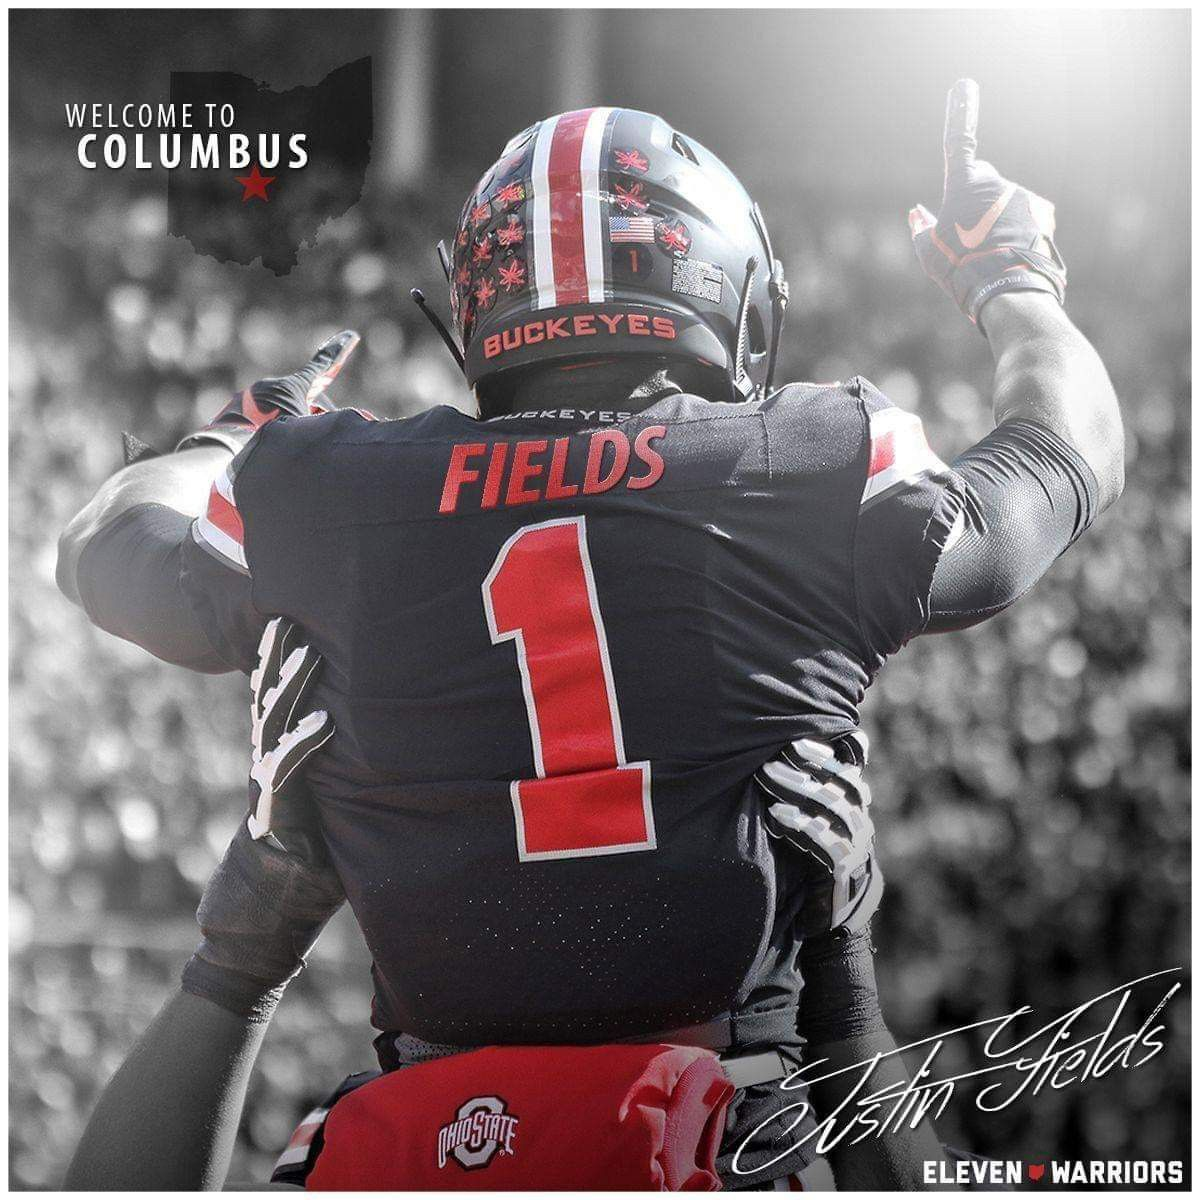 Justin Fields Qb Ohio State Football Players Ohio State Buckeyes Football Ohio State Wallpaper